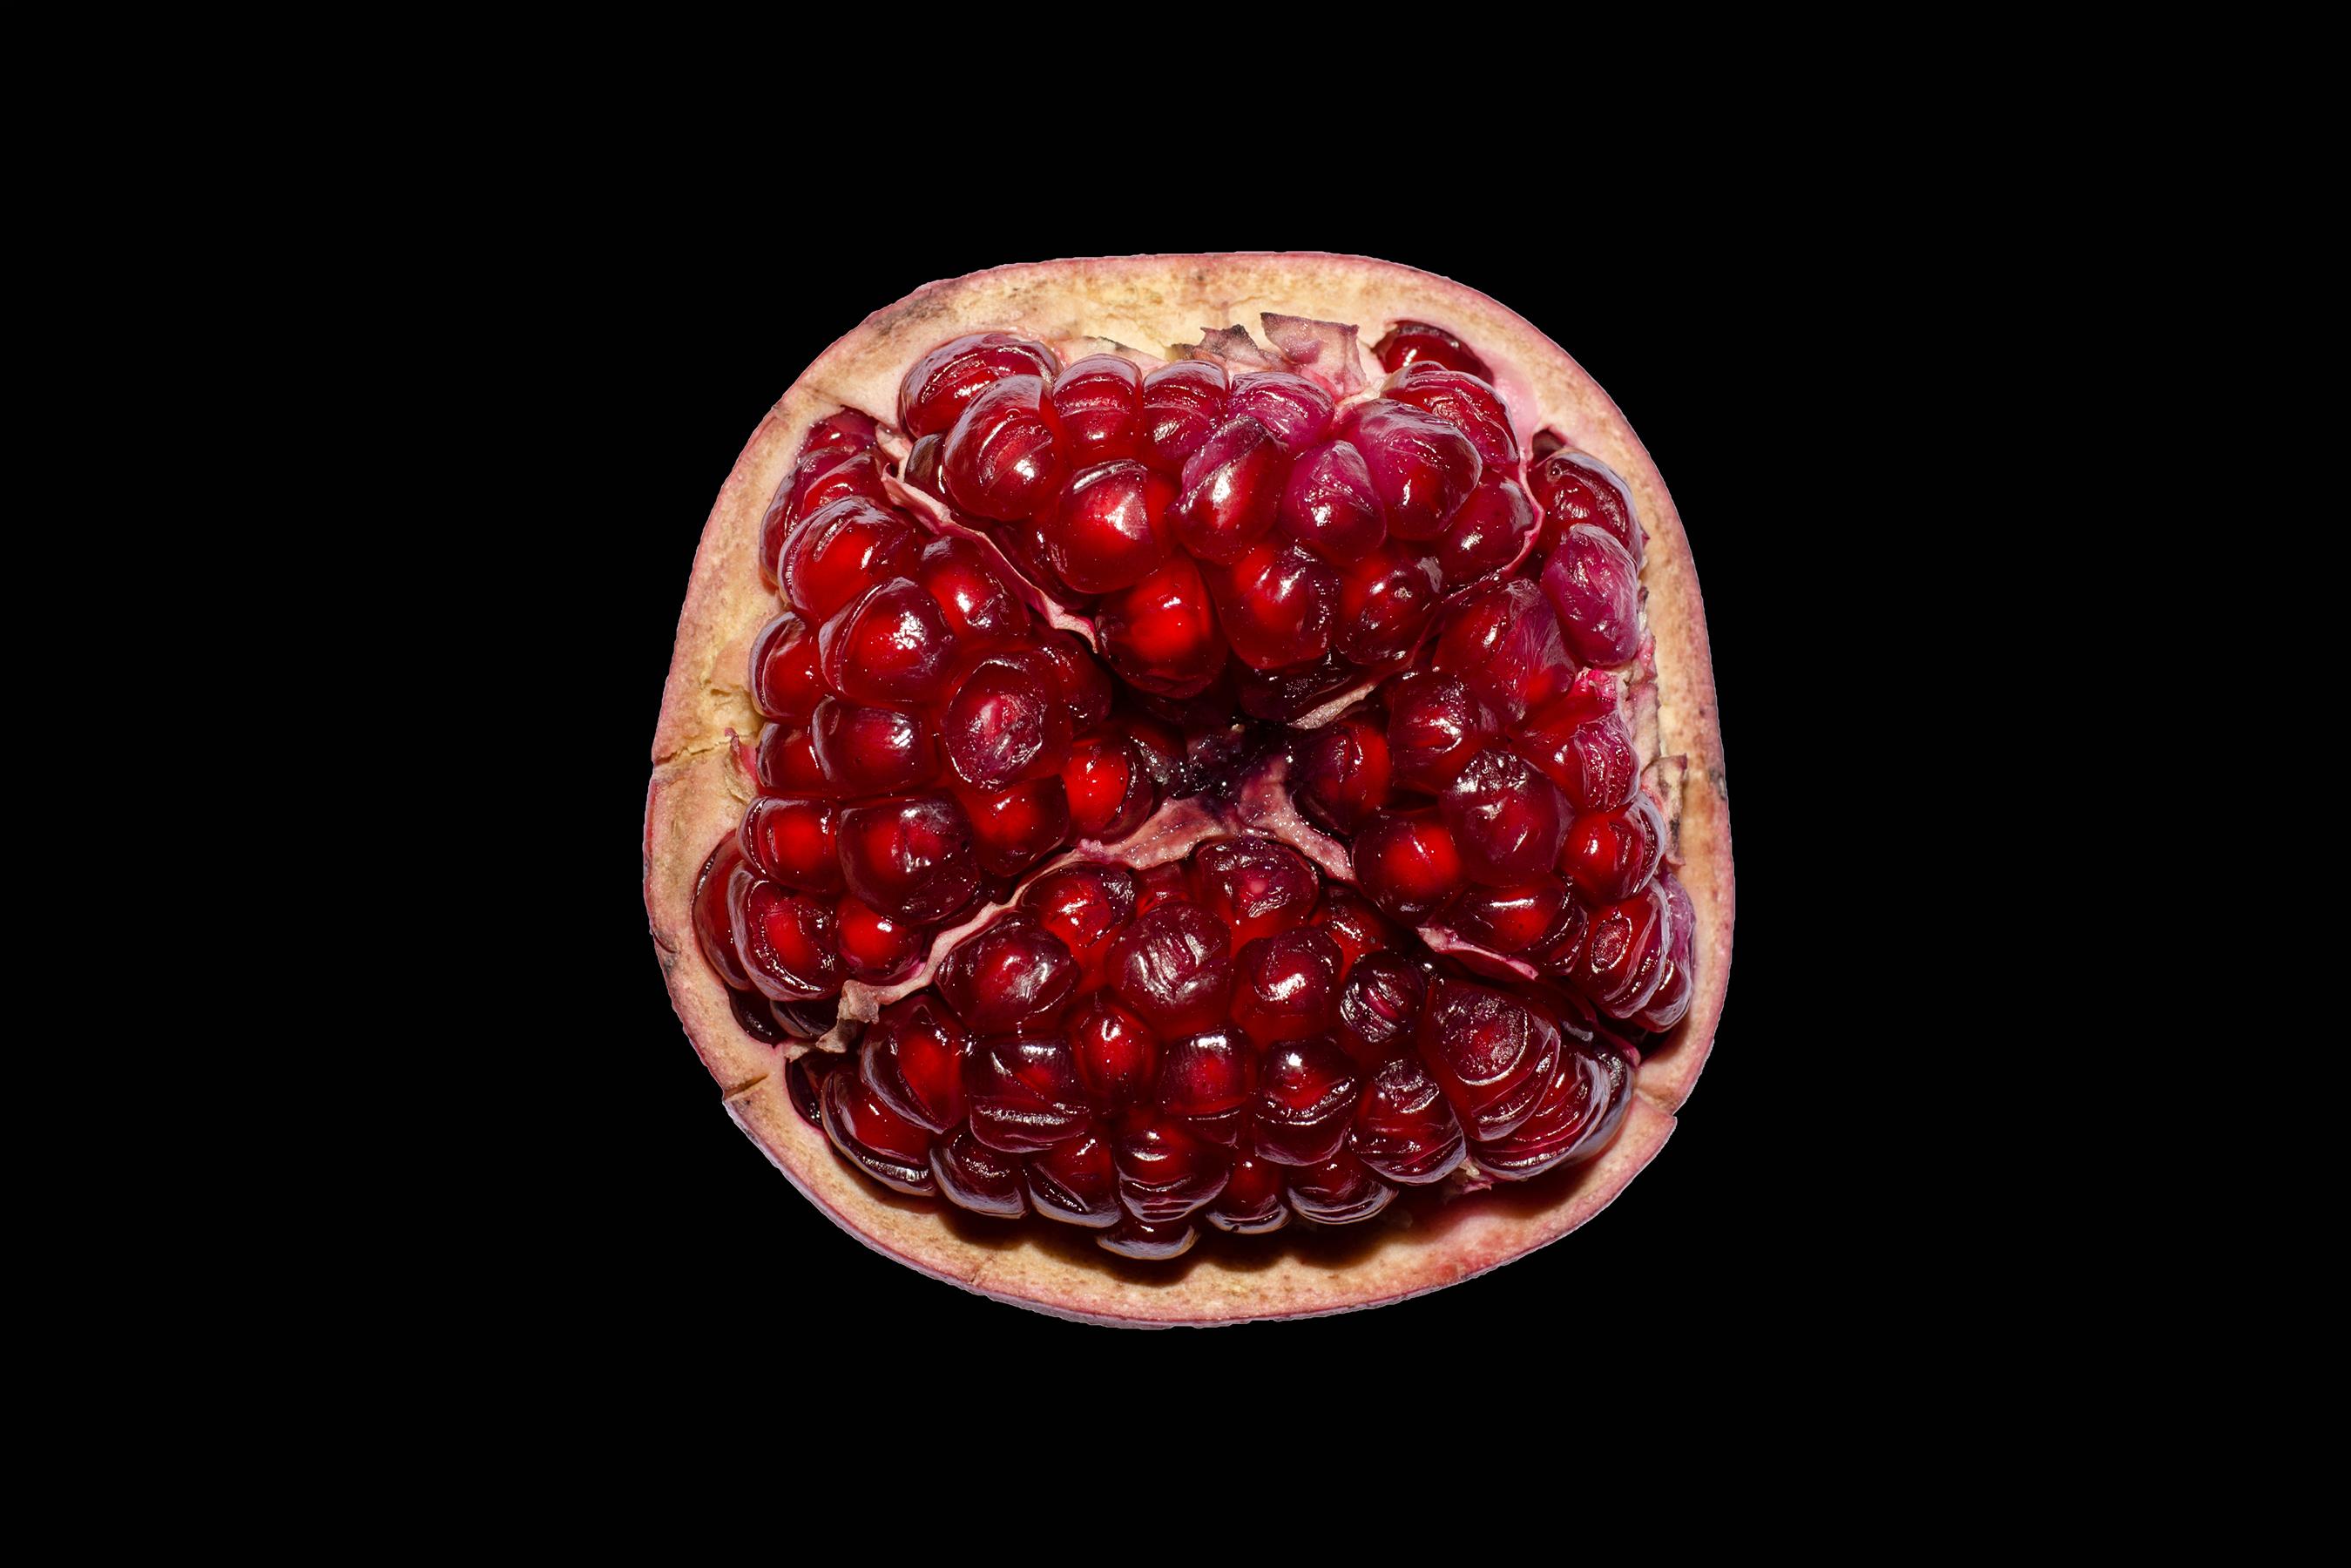 half peeled pomegranate bnc.jpg